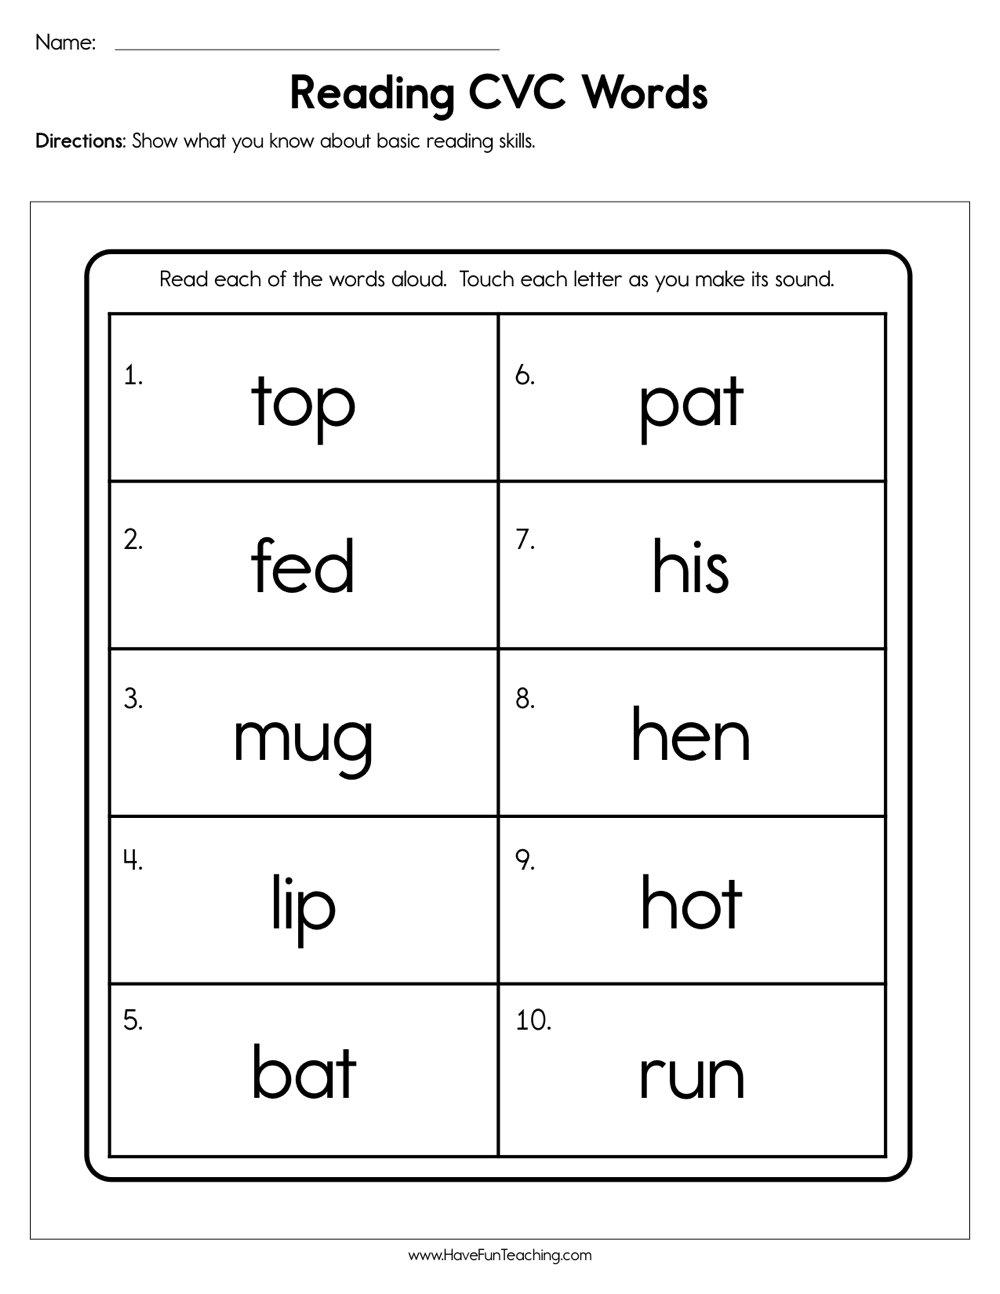 Reading Cvc Words Worksheet